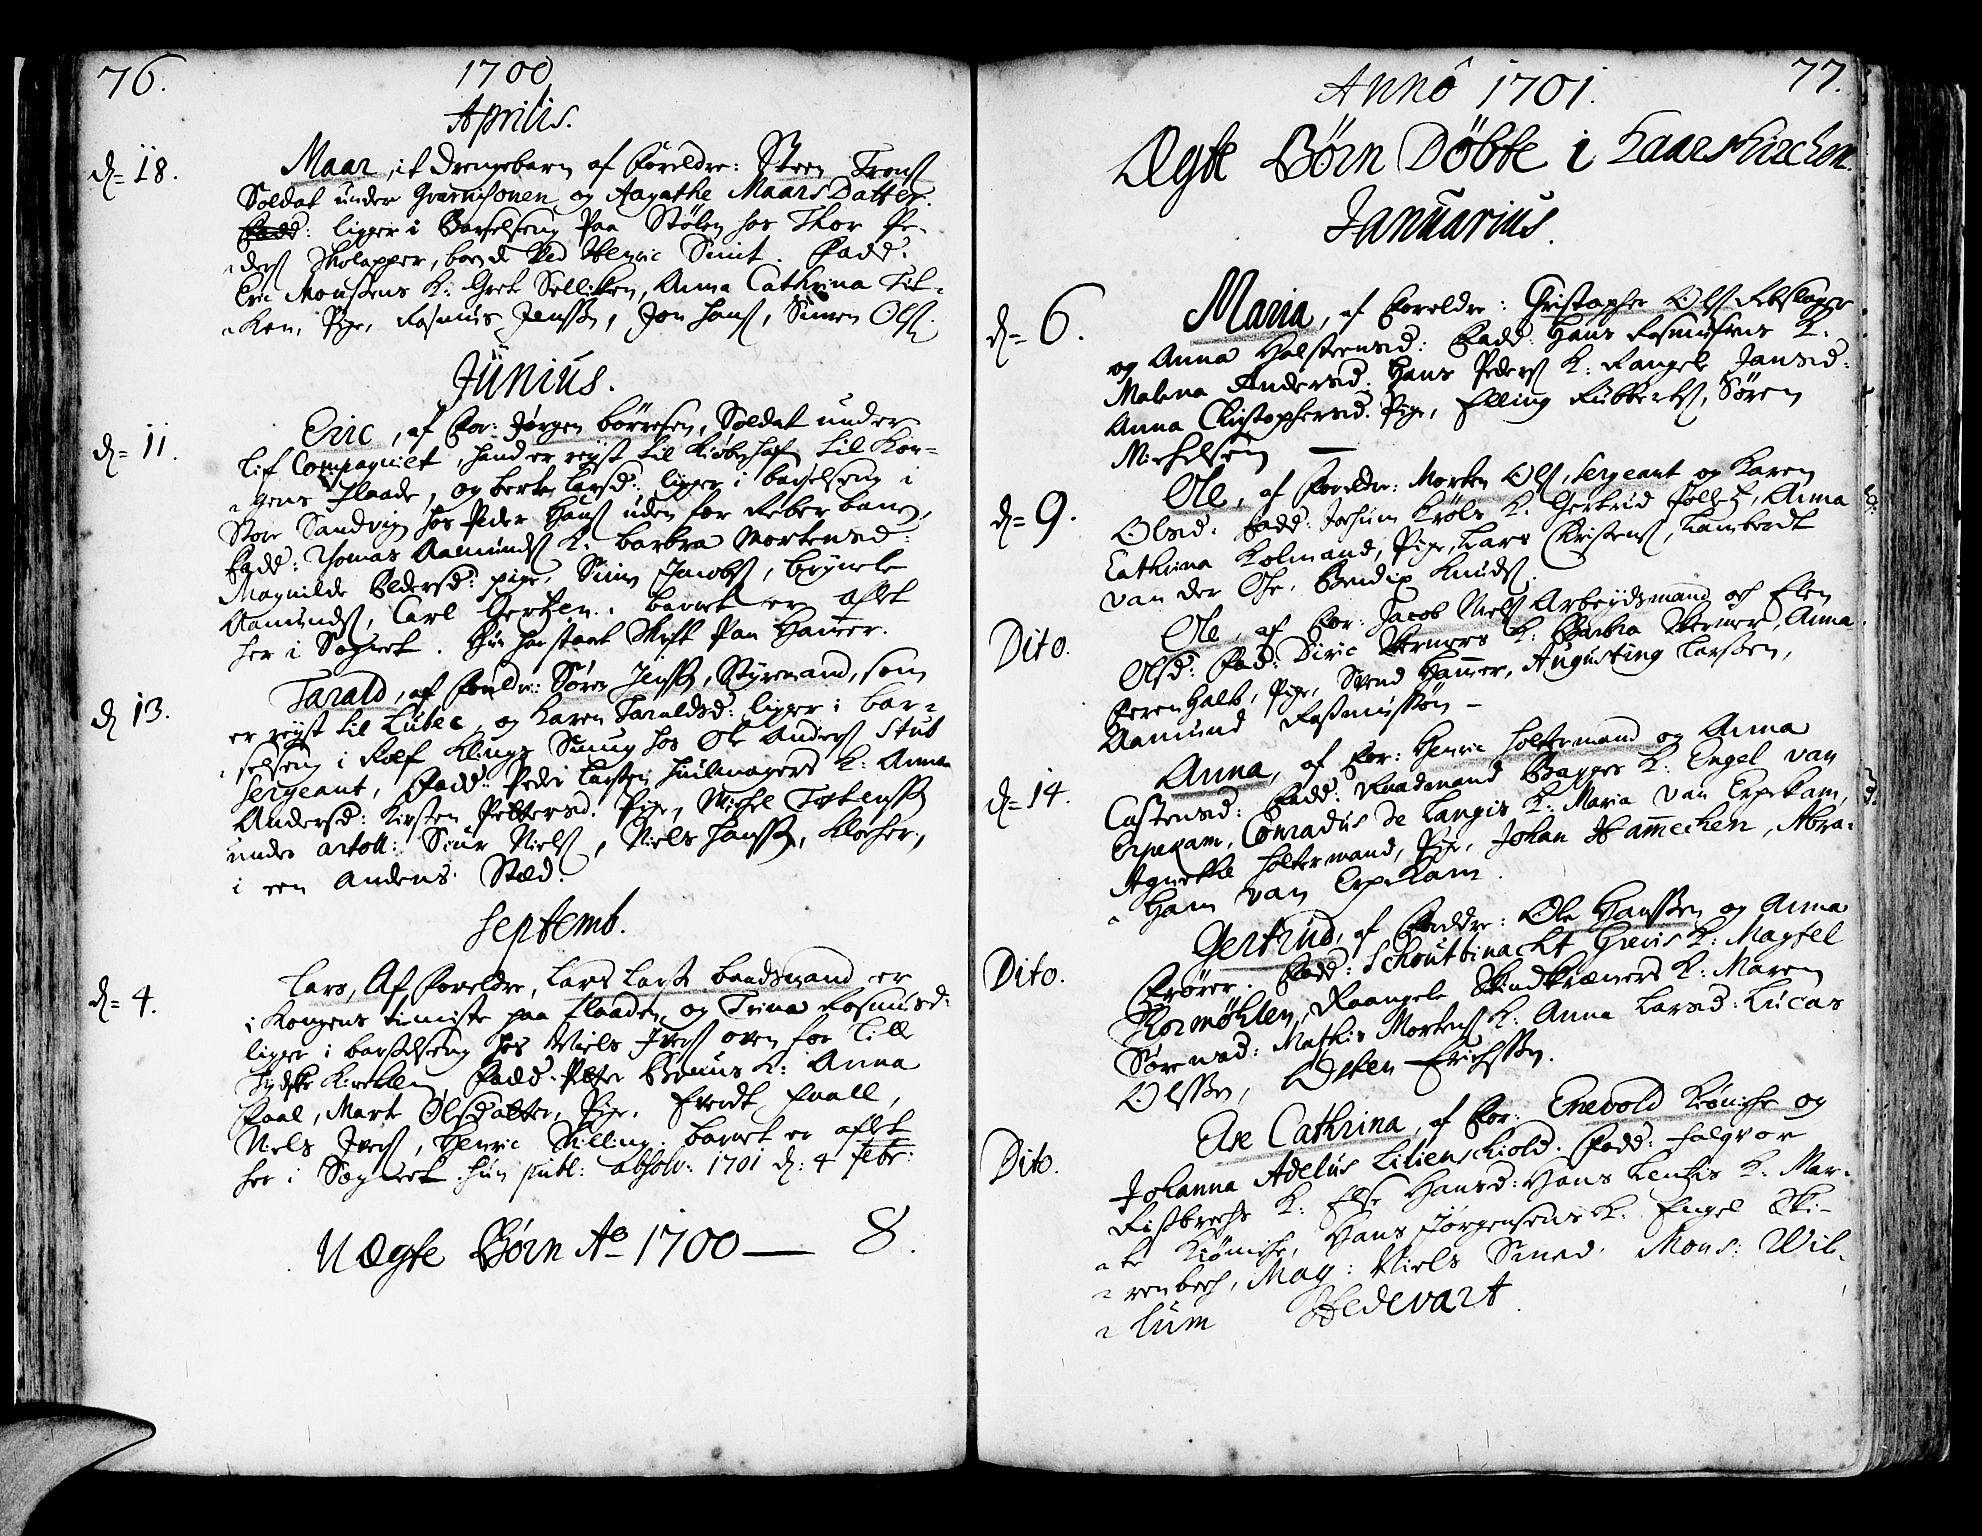 SAB, Korskirken Sokneprestembete, H/Haa/L0003: Ministerialbok nr. A 3, 1698-1719, s. 76-77